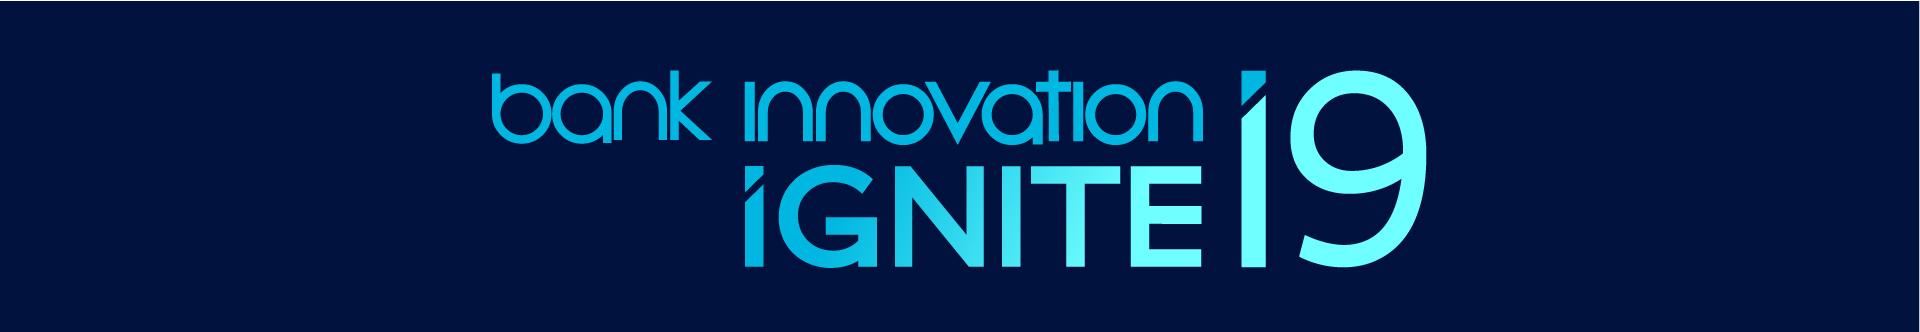 Bank Innovation Ignite